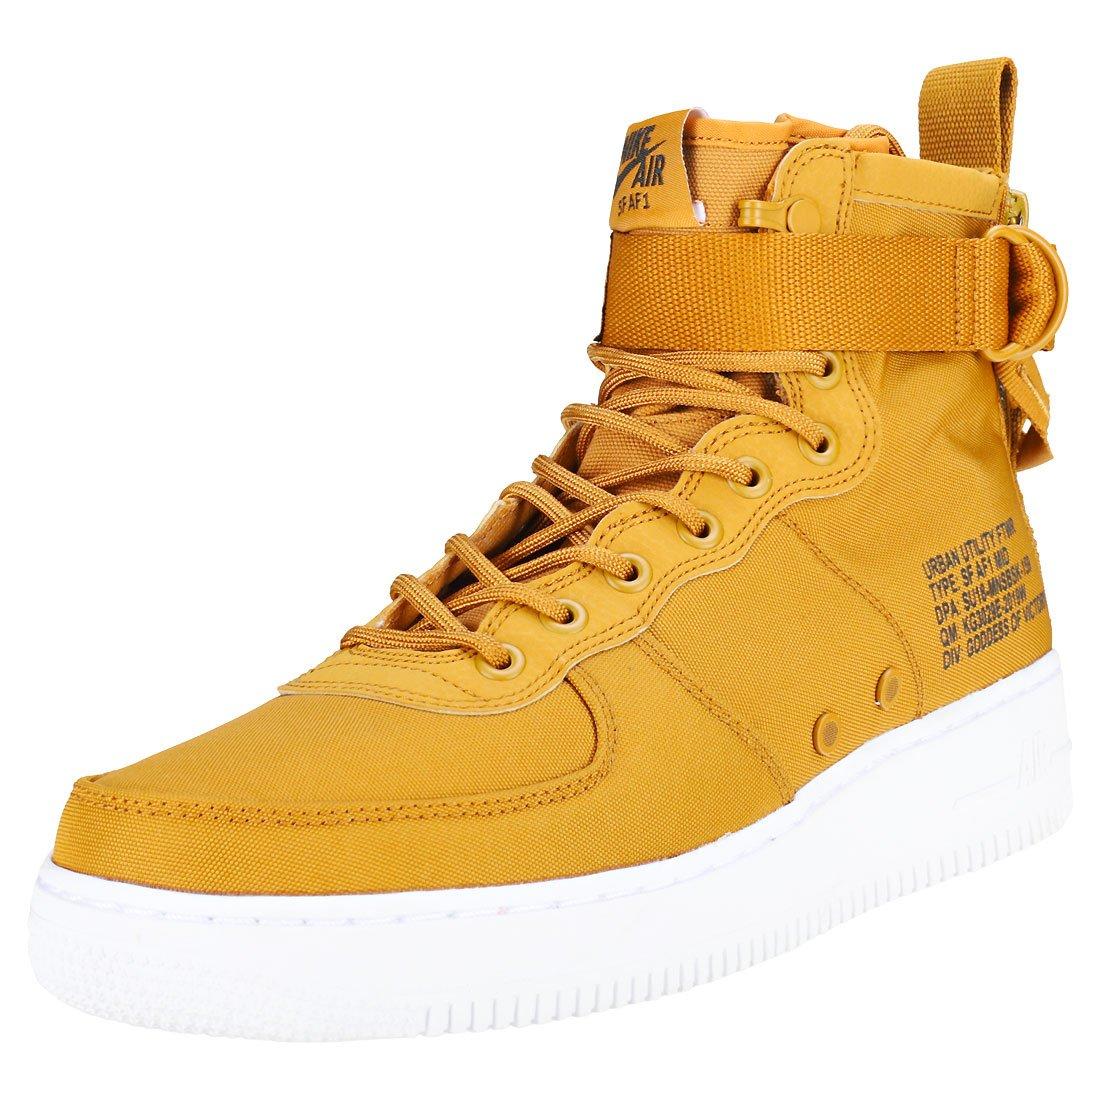 Nike Nike Nike Sf Af1 Mid - desert ochre sequoia-Weiß 0325c6